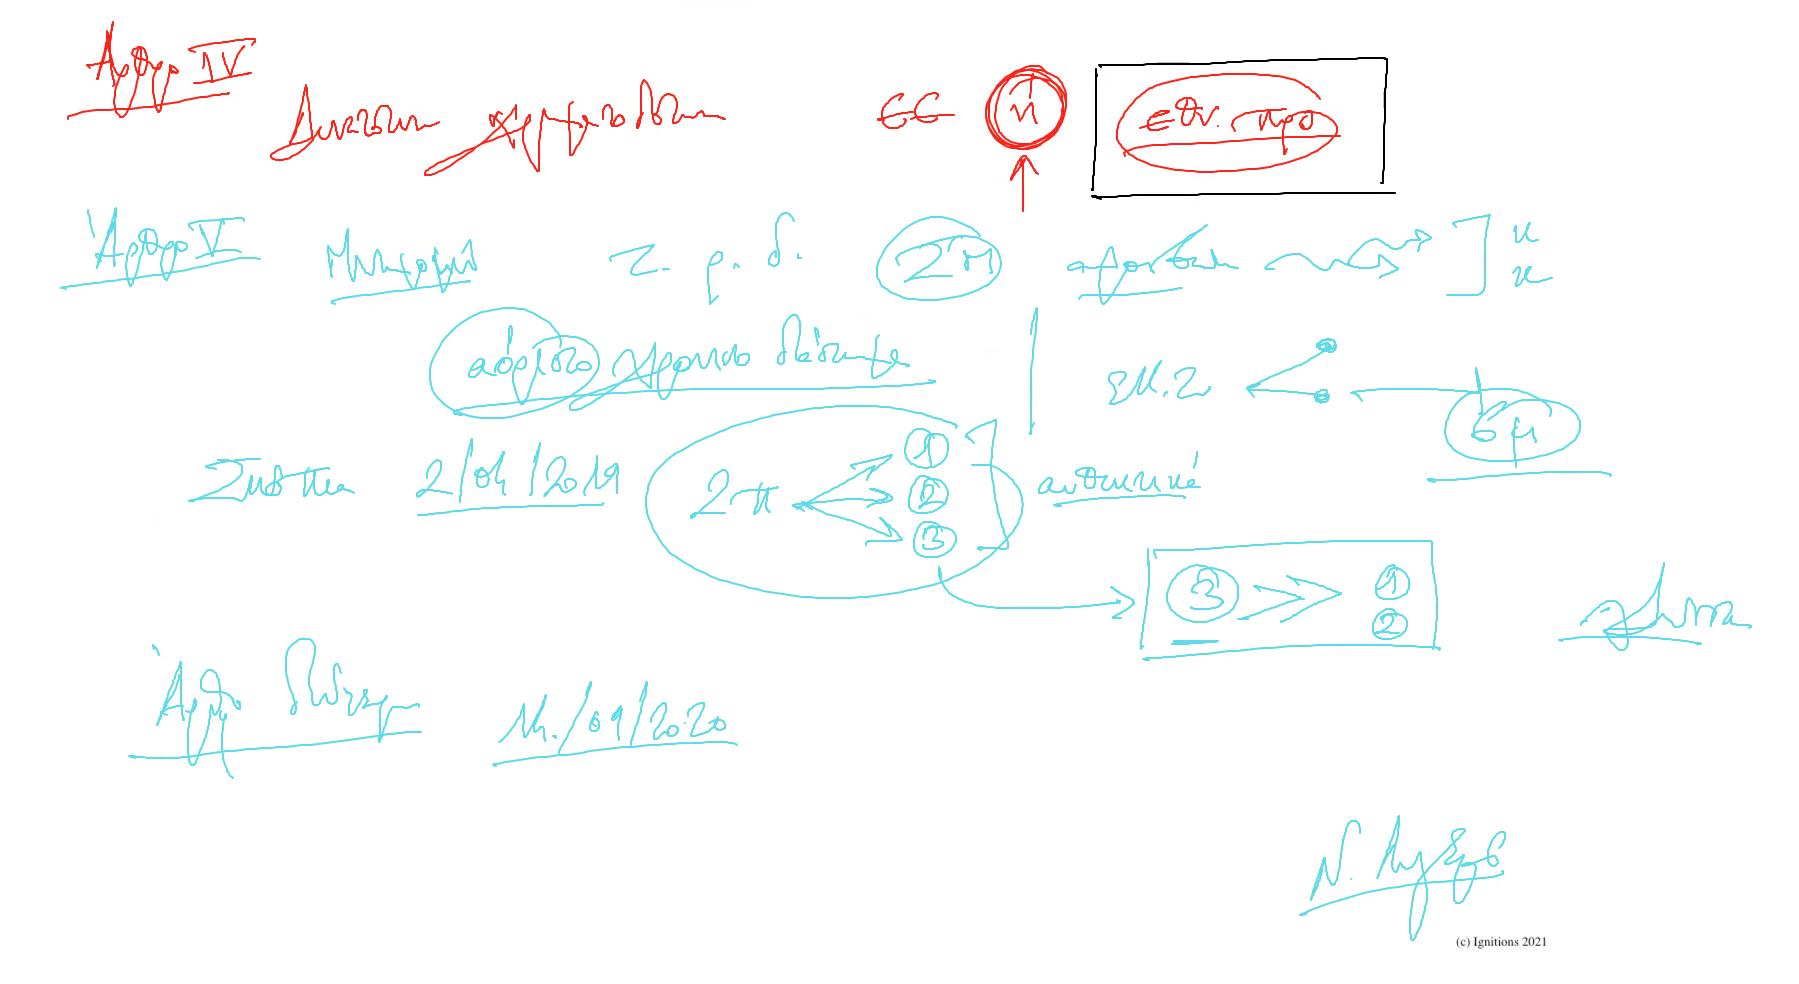 60801 - IV - Στρατηγική ανάλυση Μνημονίου Συνεργασίας. ΔΙΑΡΚΕΙΑ VΙΙ. (Dessin)